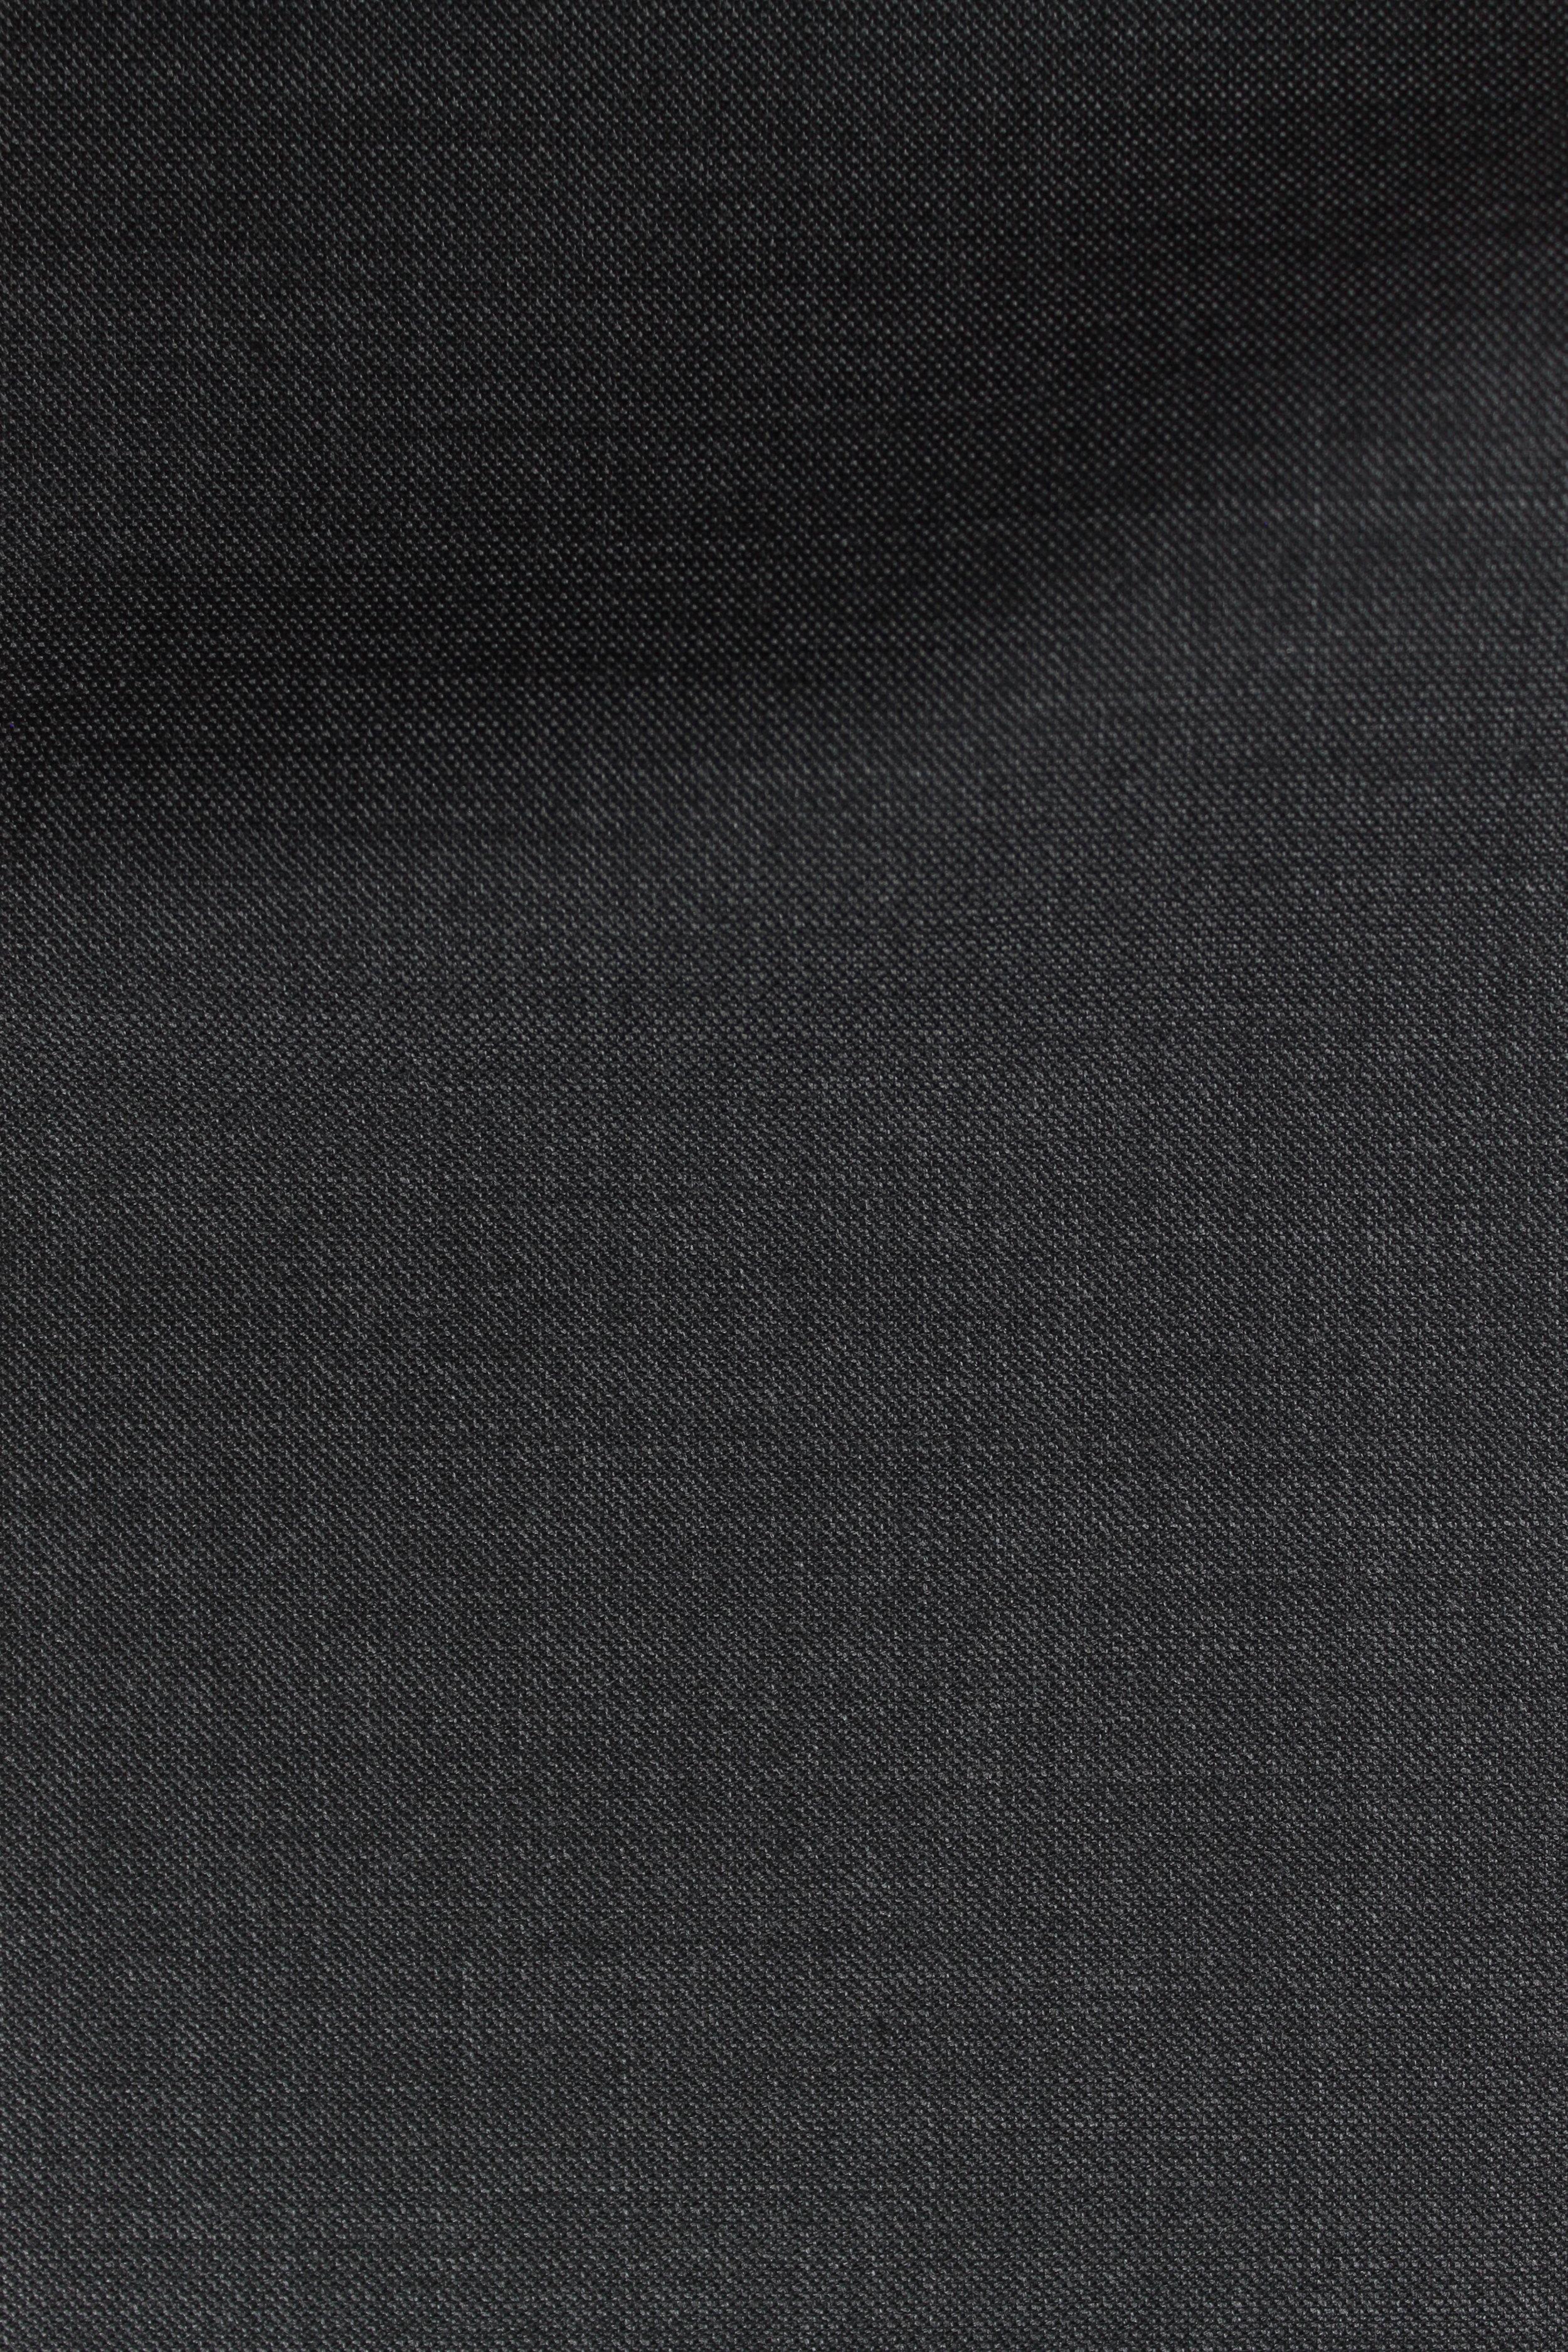 7618 Dark Grey Nailshead Twill 270g.JPG